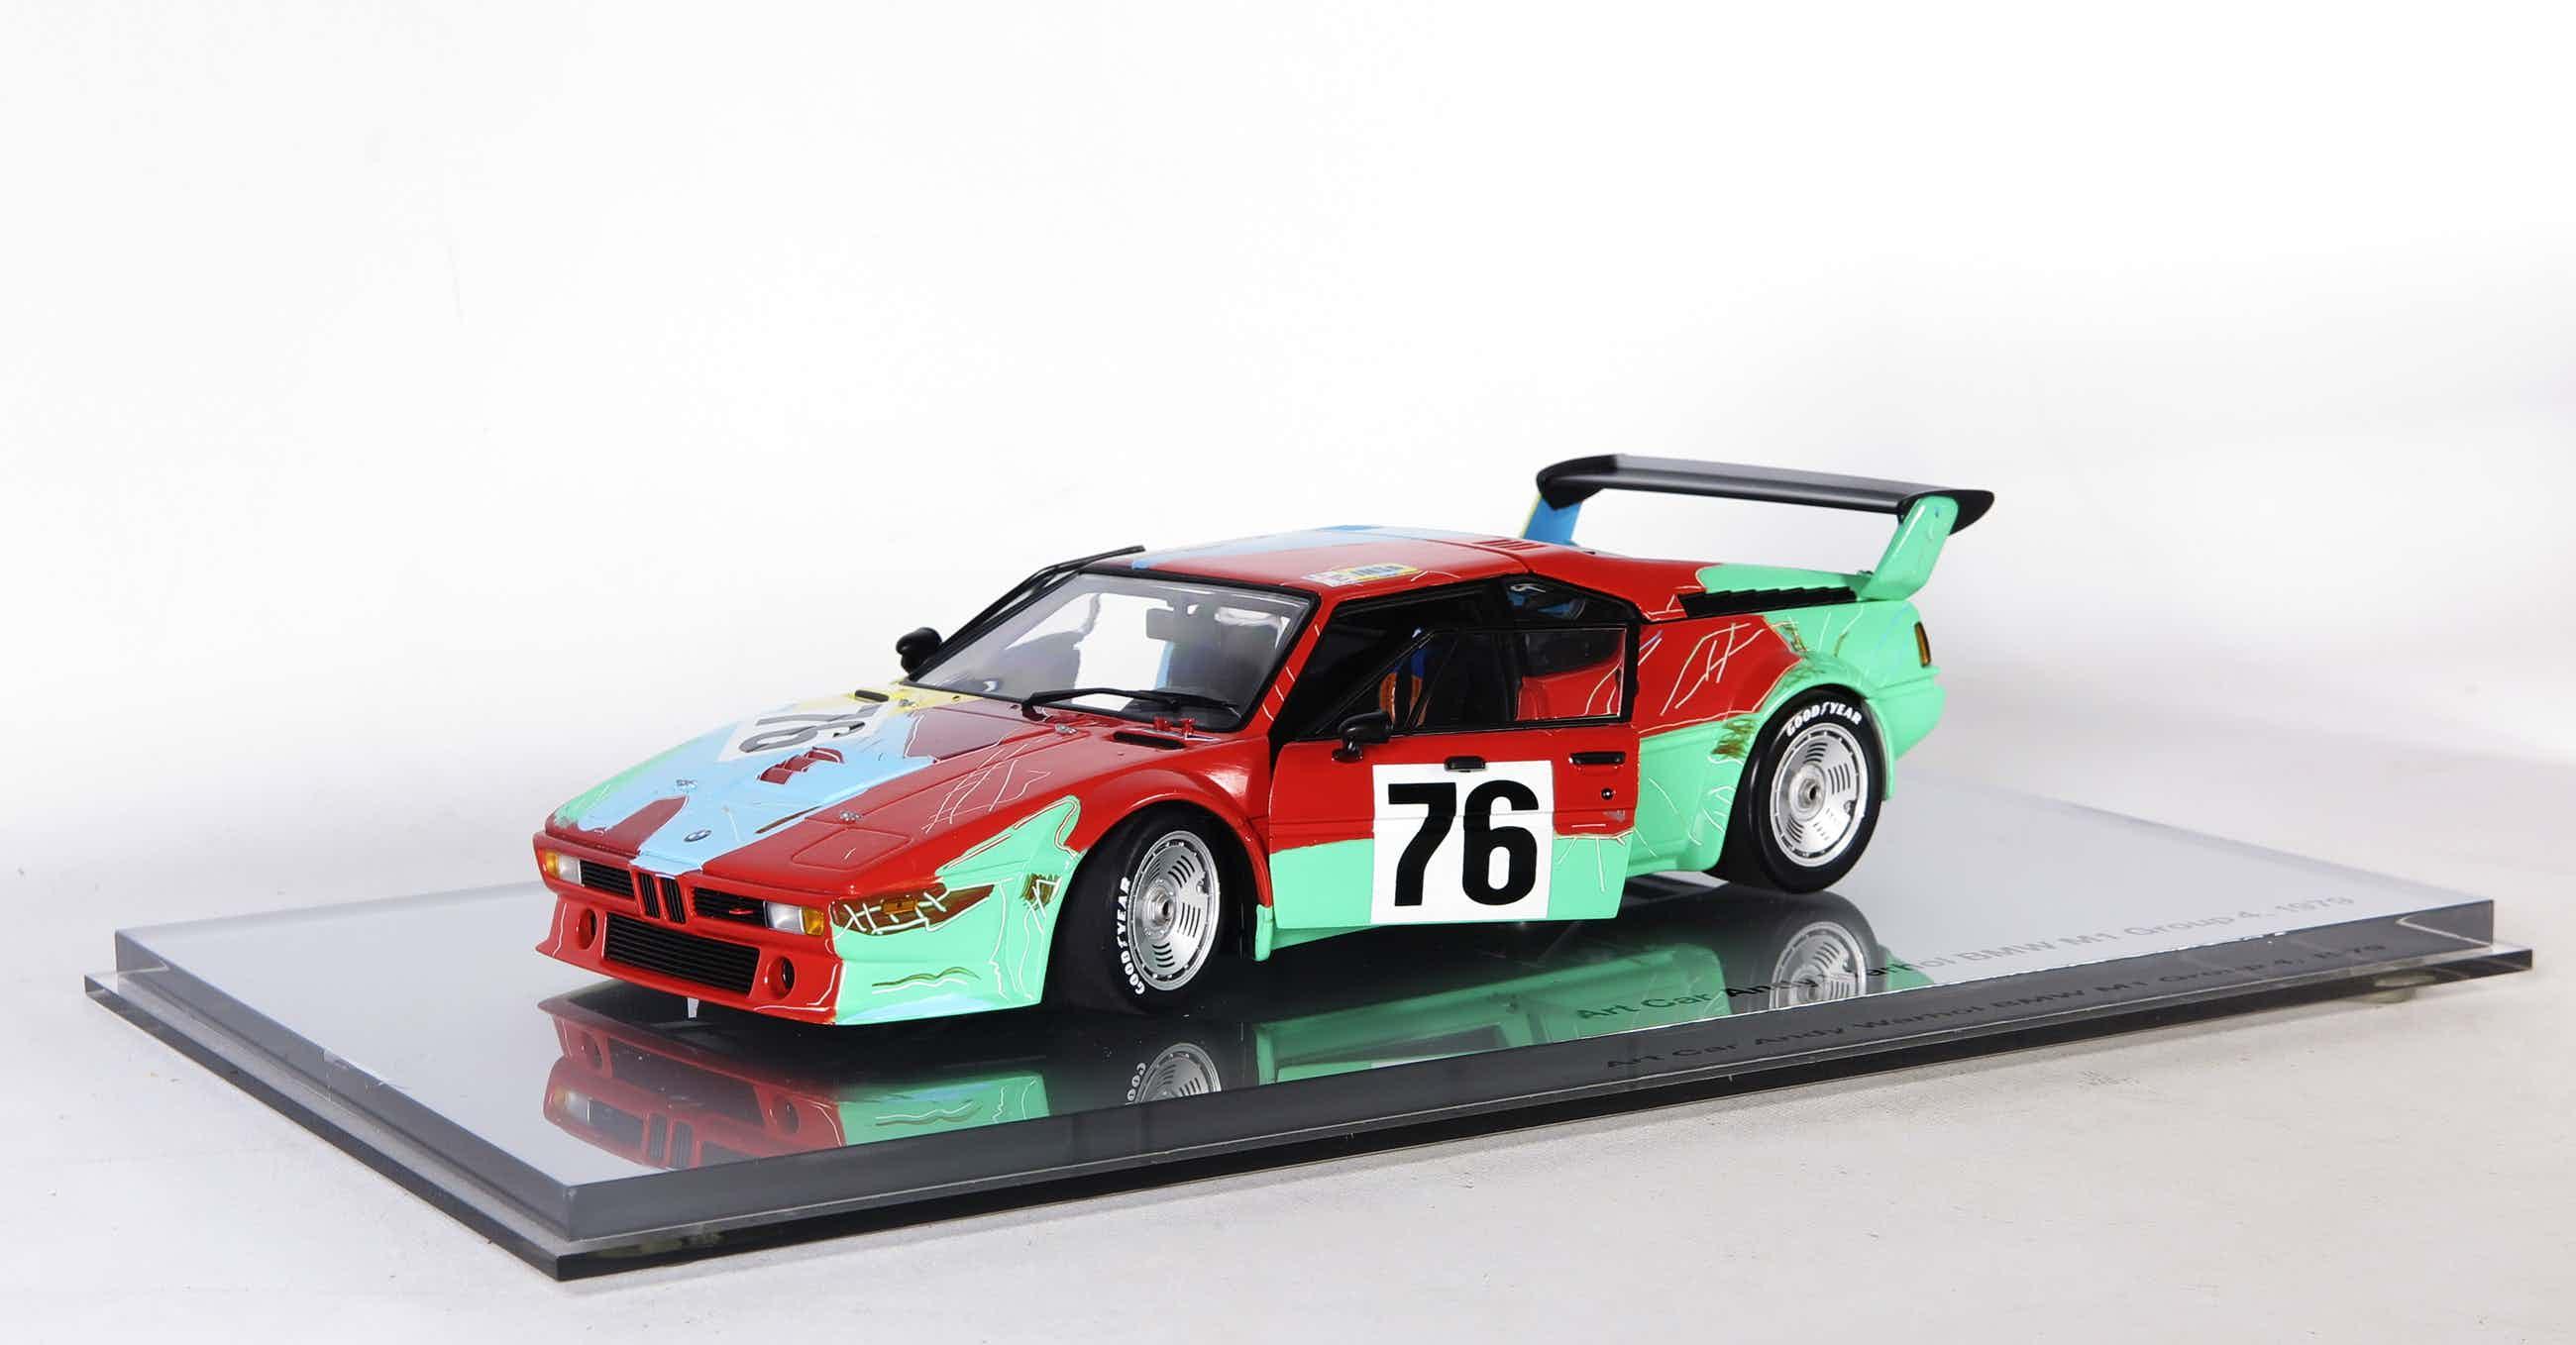 Andy Warhol - Art Car Andy Warhol BMW M1 Group 4, 1979 kopen? Bied vanaf 385!